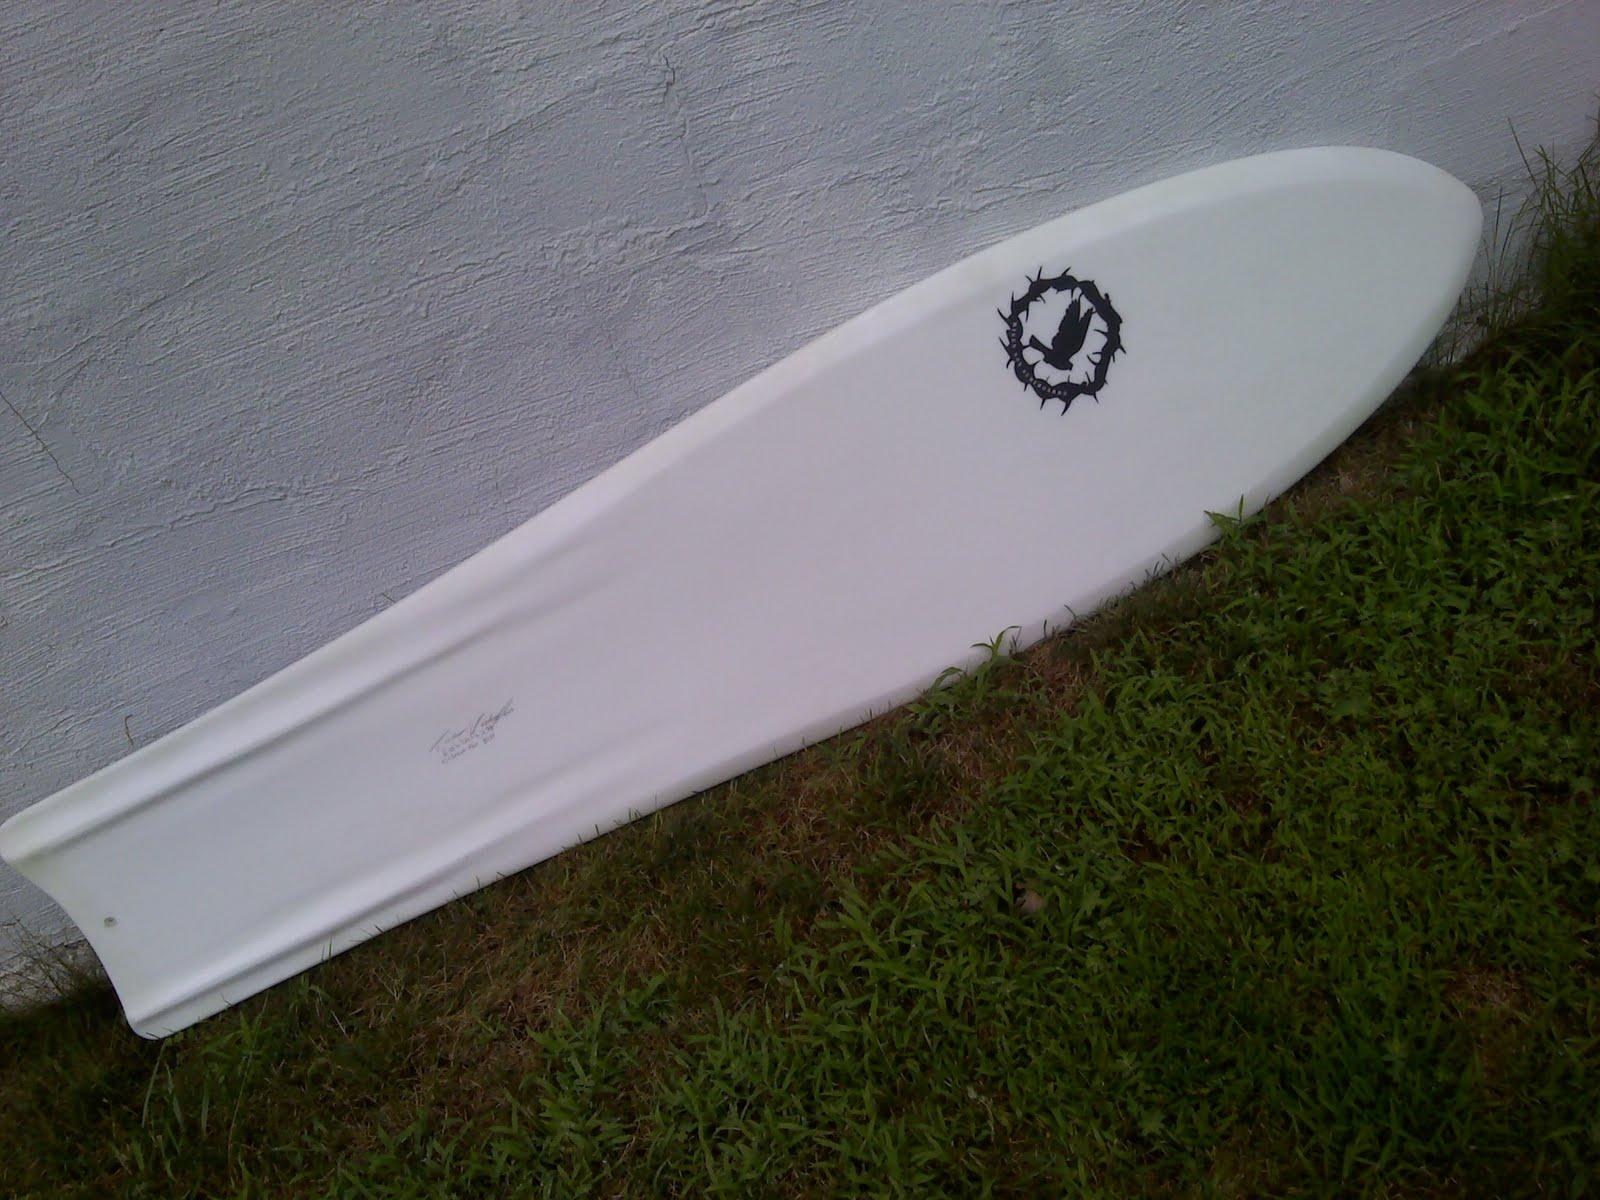 skimboard template - risen sun surfboards and skimboard manufacturing new